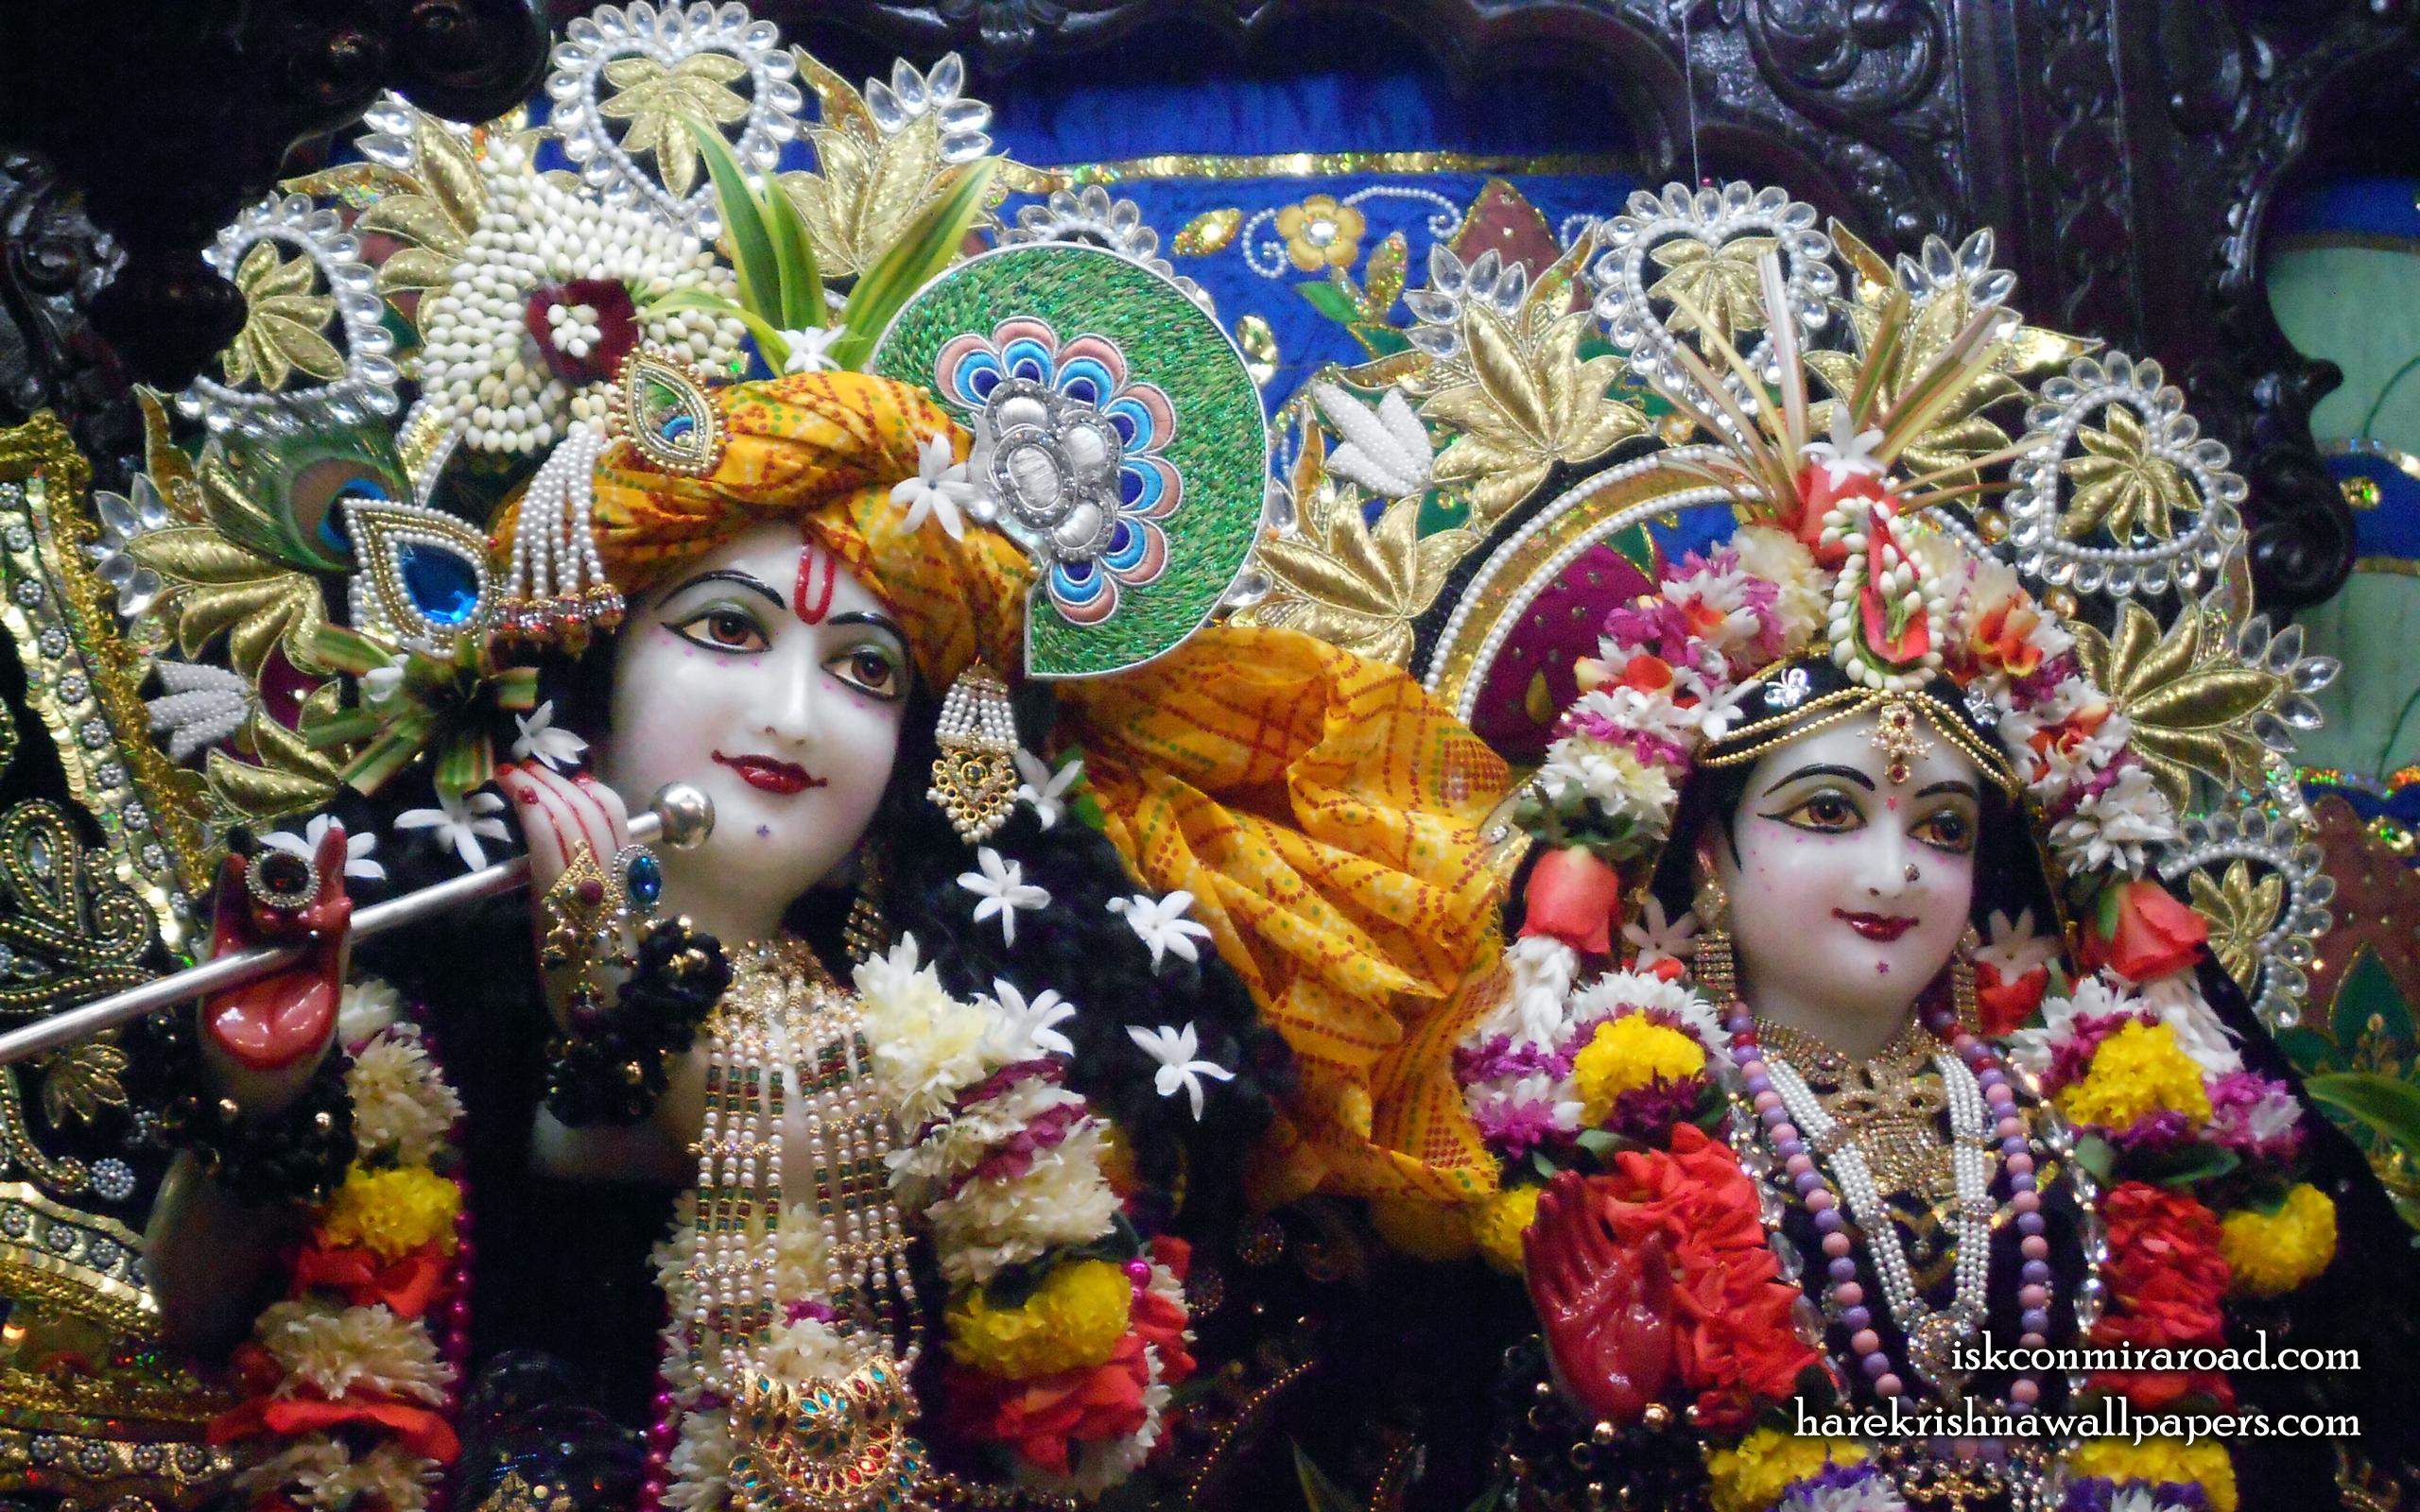 Sri Sri Radha Giridhari Close up Wallpaper (027) Size 2560x1600 Download